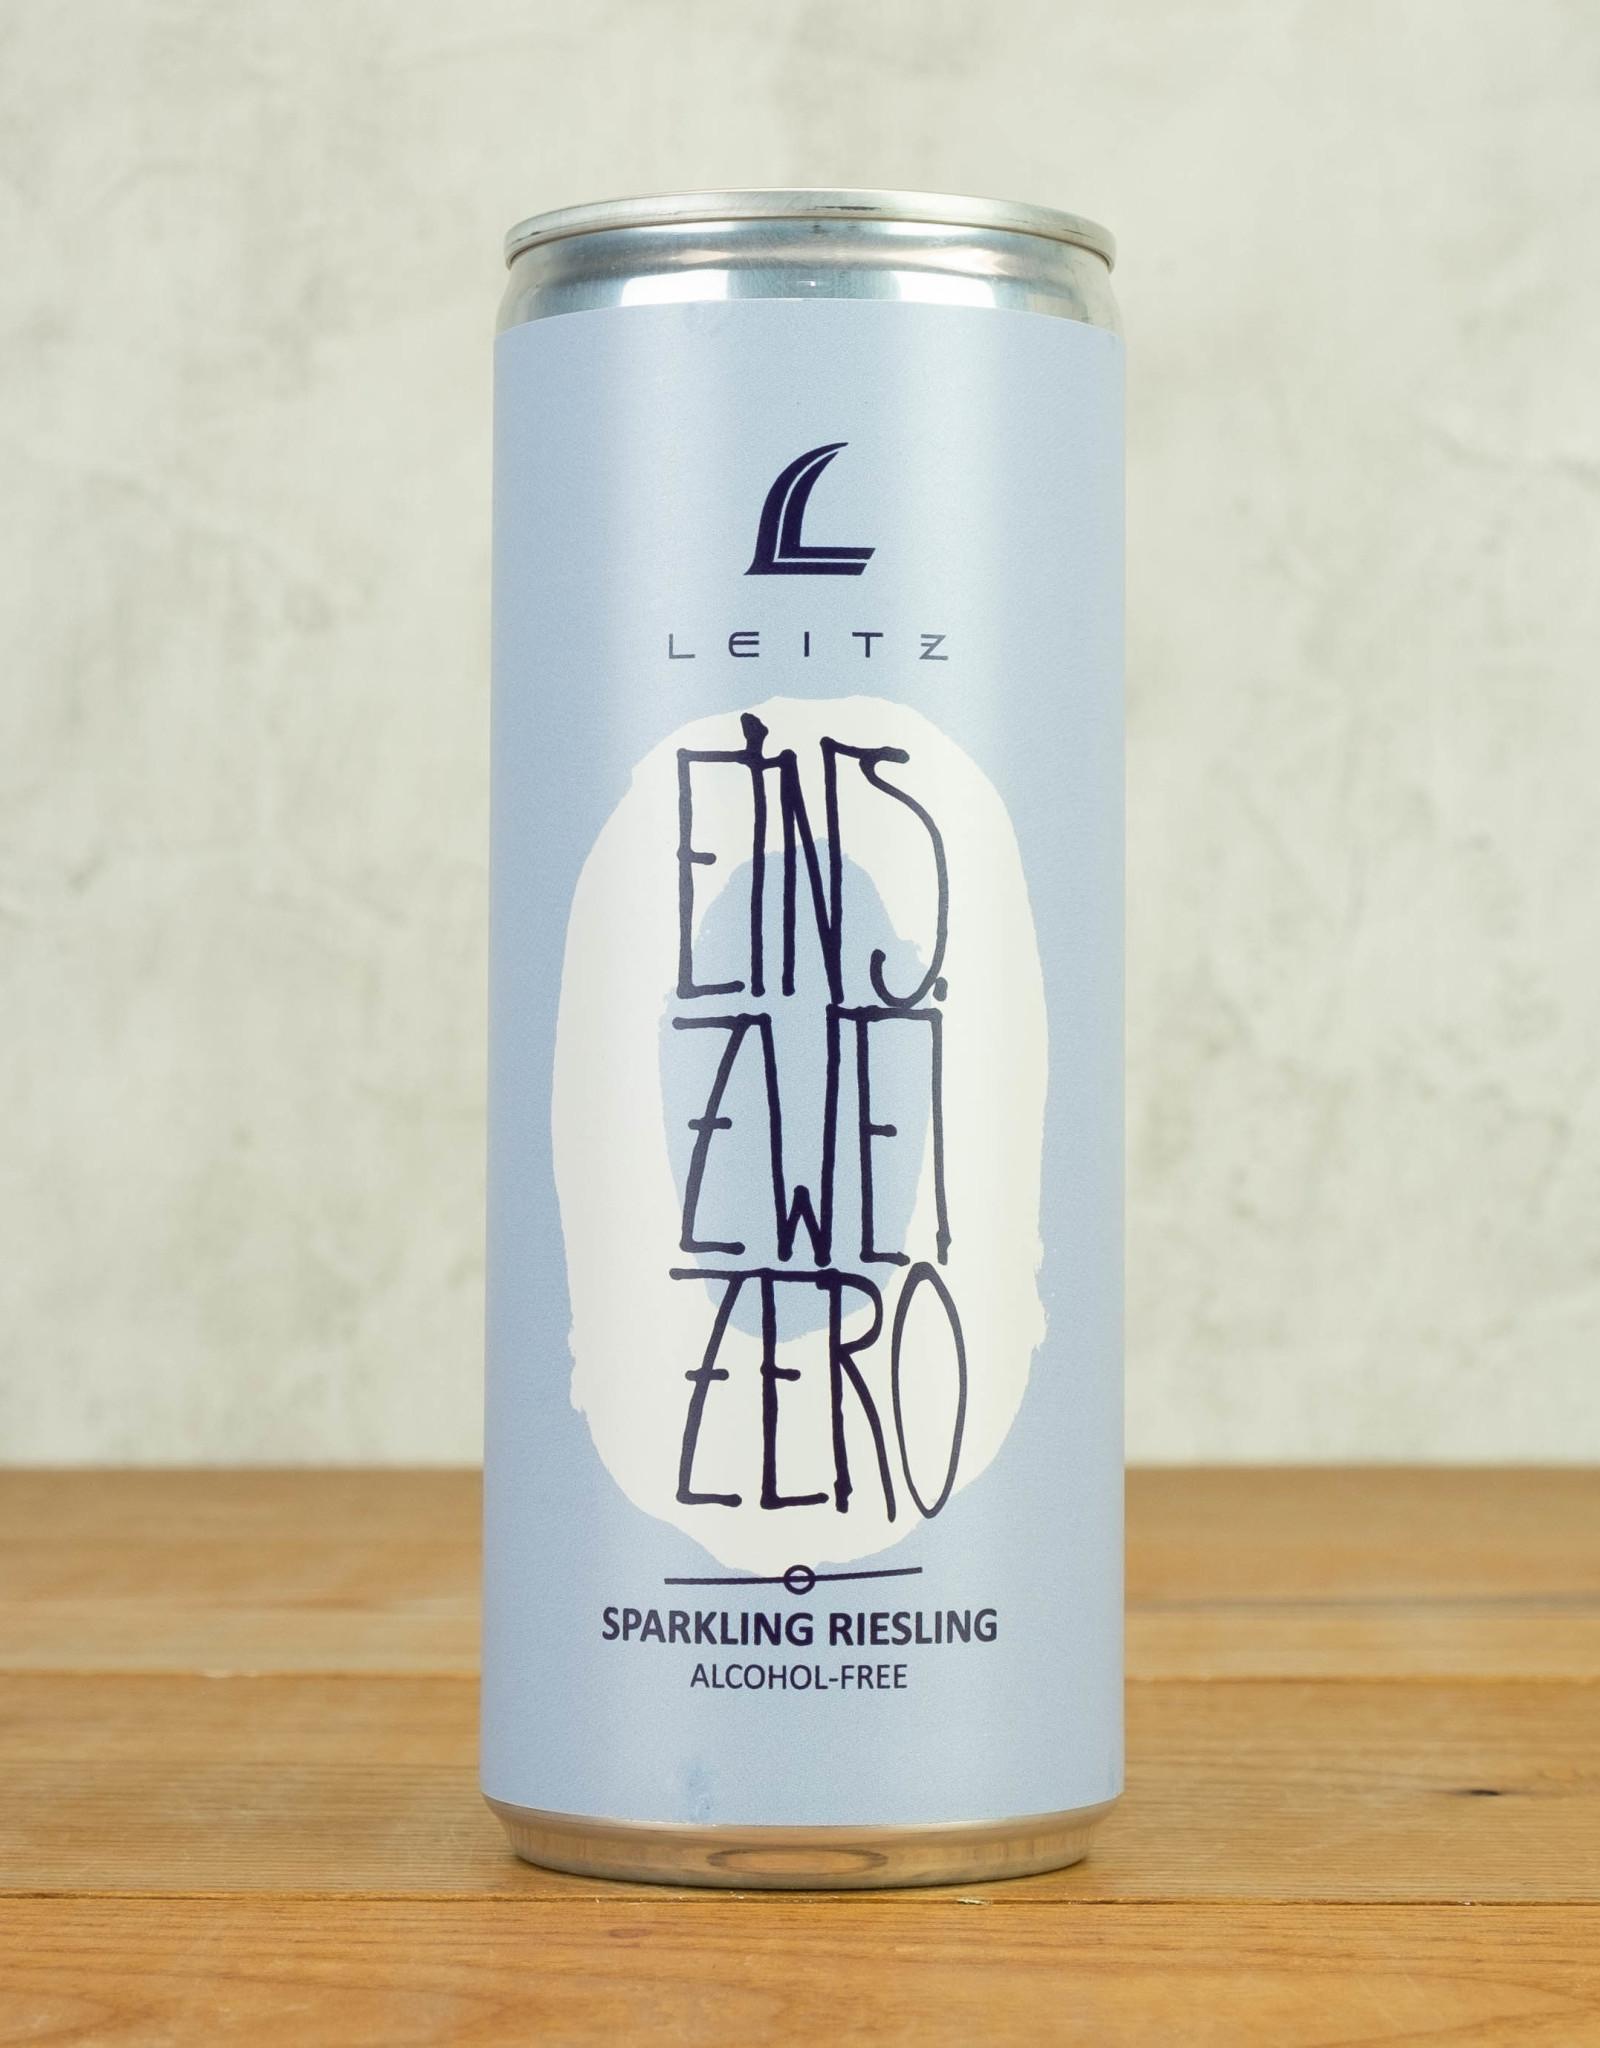 Leitz Eins Zwei Zero Non-Alc Sparkling Riesling 250ml Can